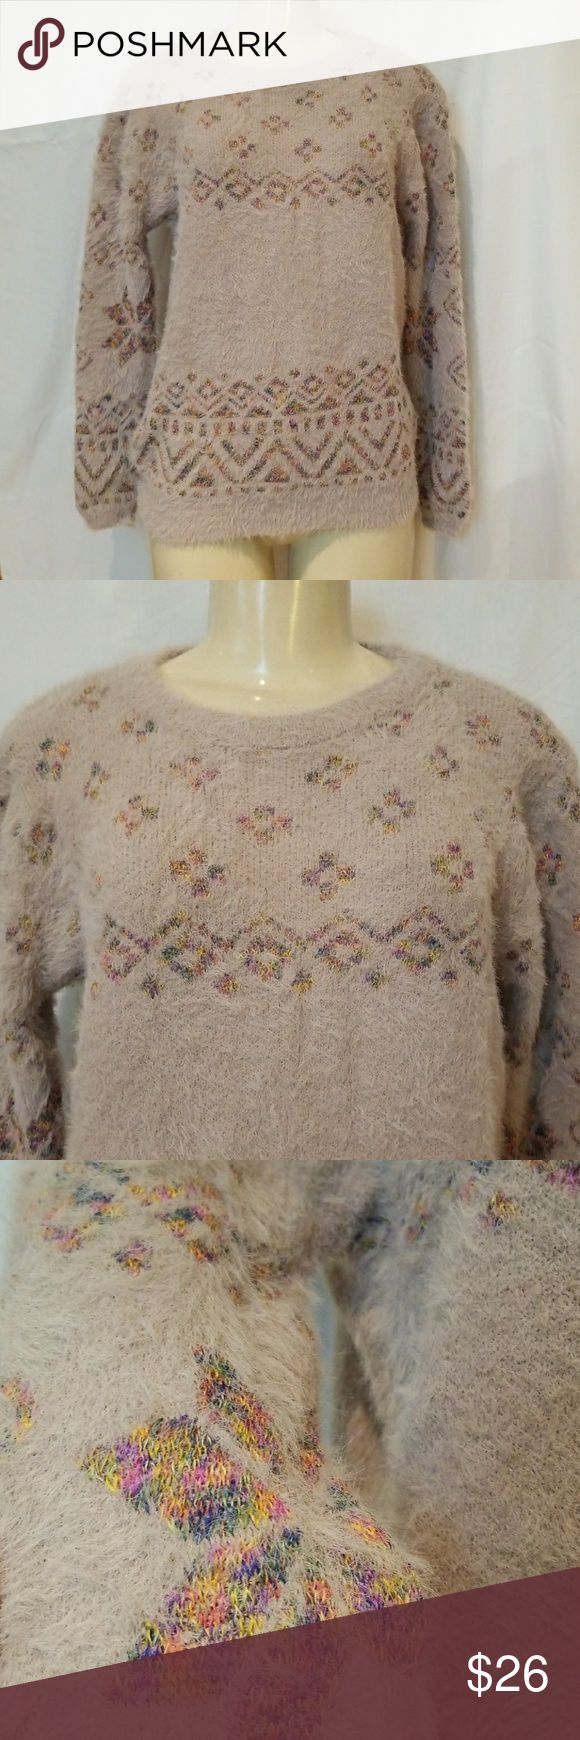 Fuzzy cream beige sweater Fuzzy sweater Cream/beige aztec print Sweaters Crew & Scoop Necks